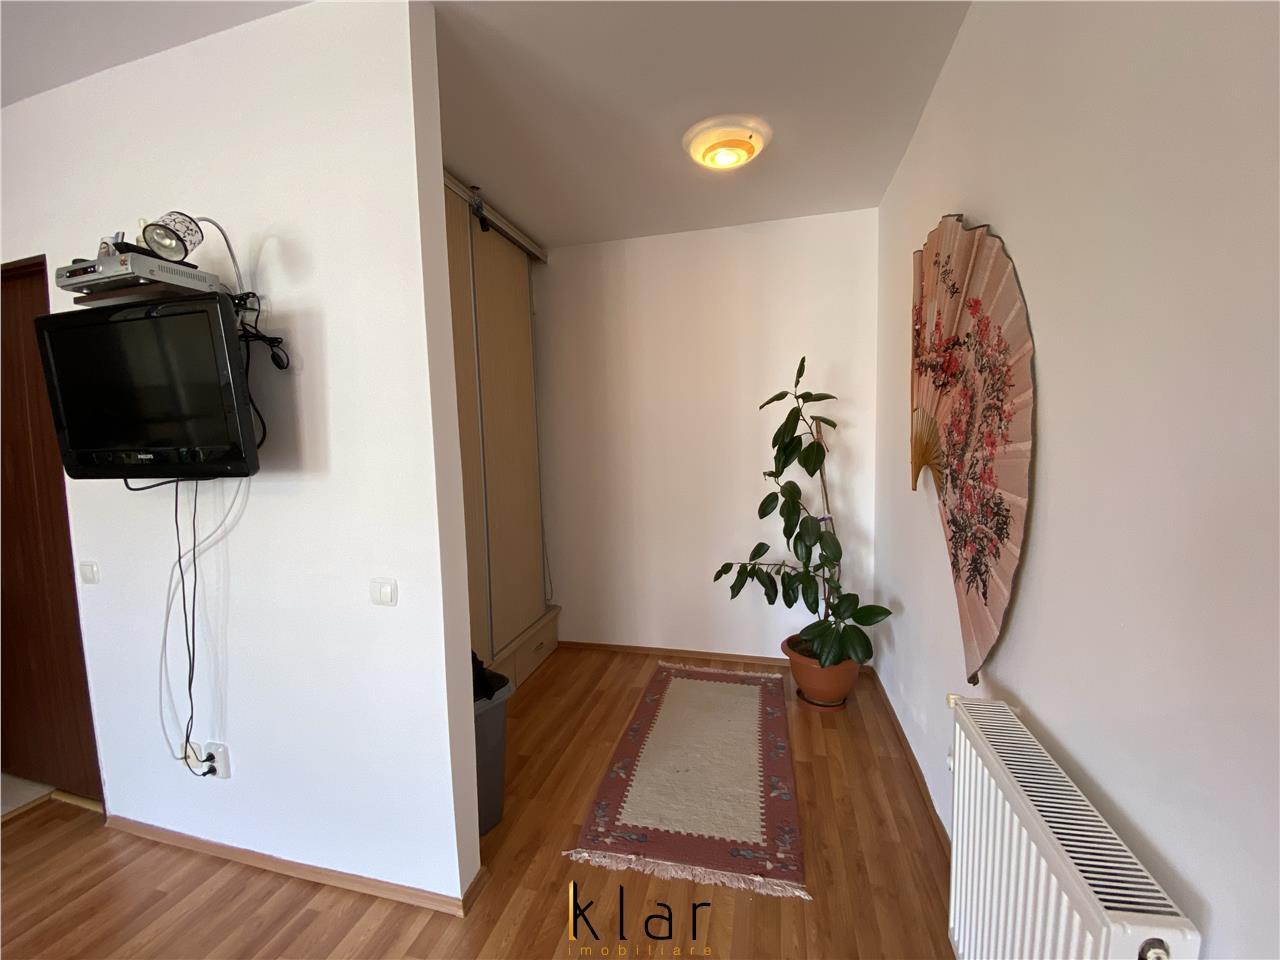 Apartament cu 3 camere, complet mobilat si utilat pe Str. Florilor